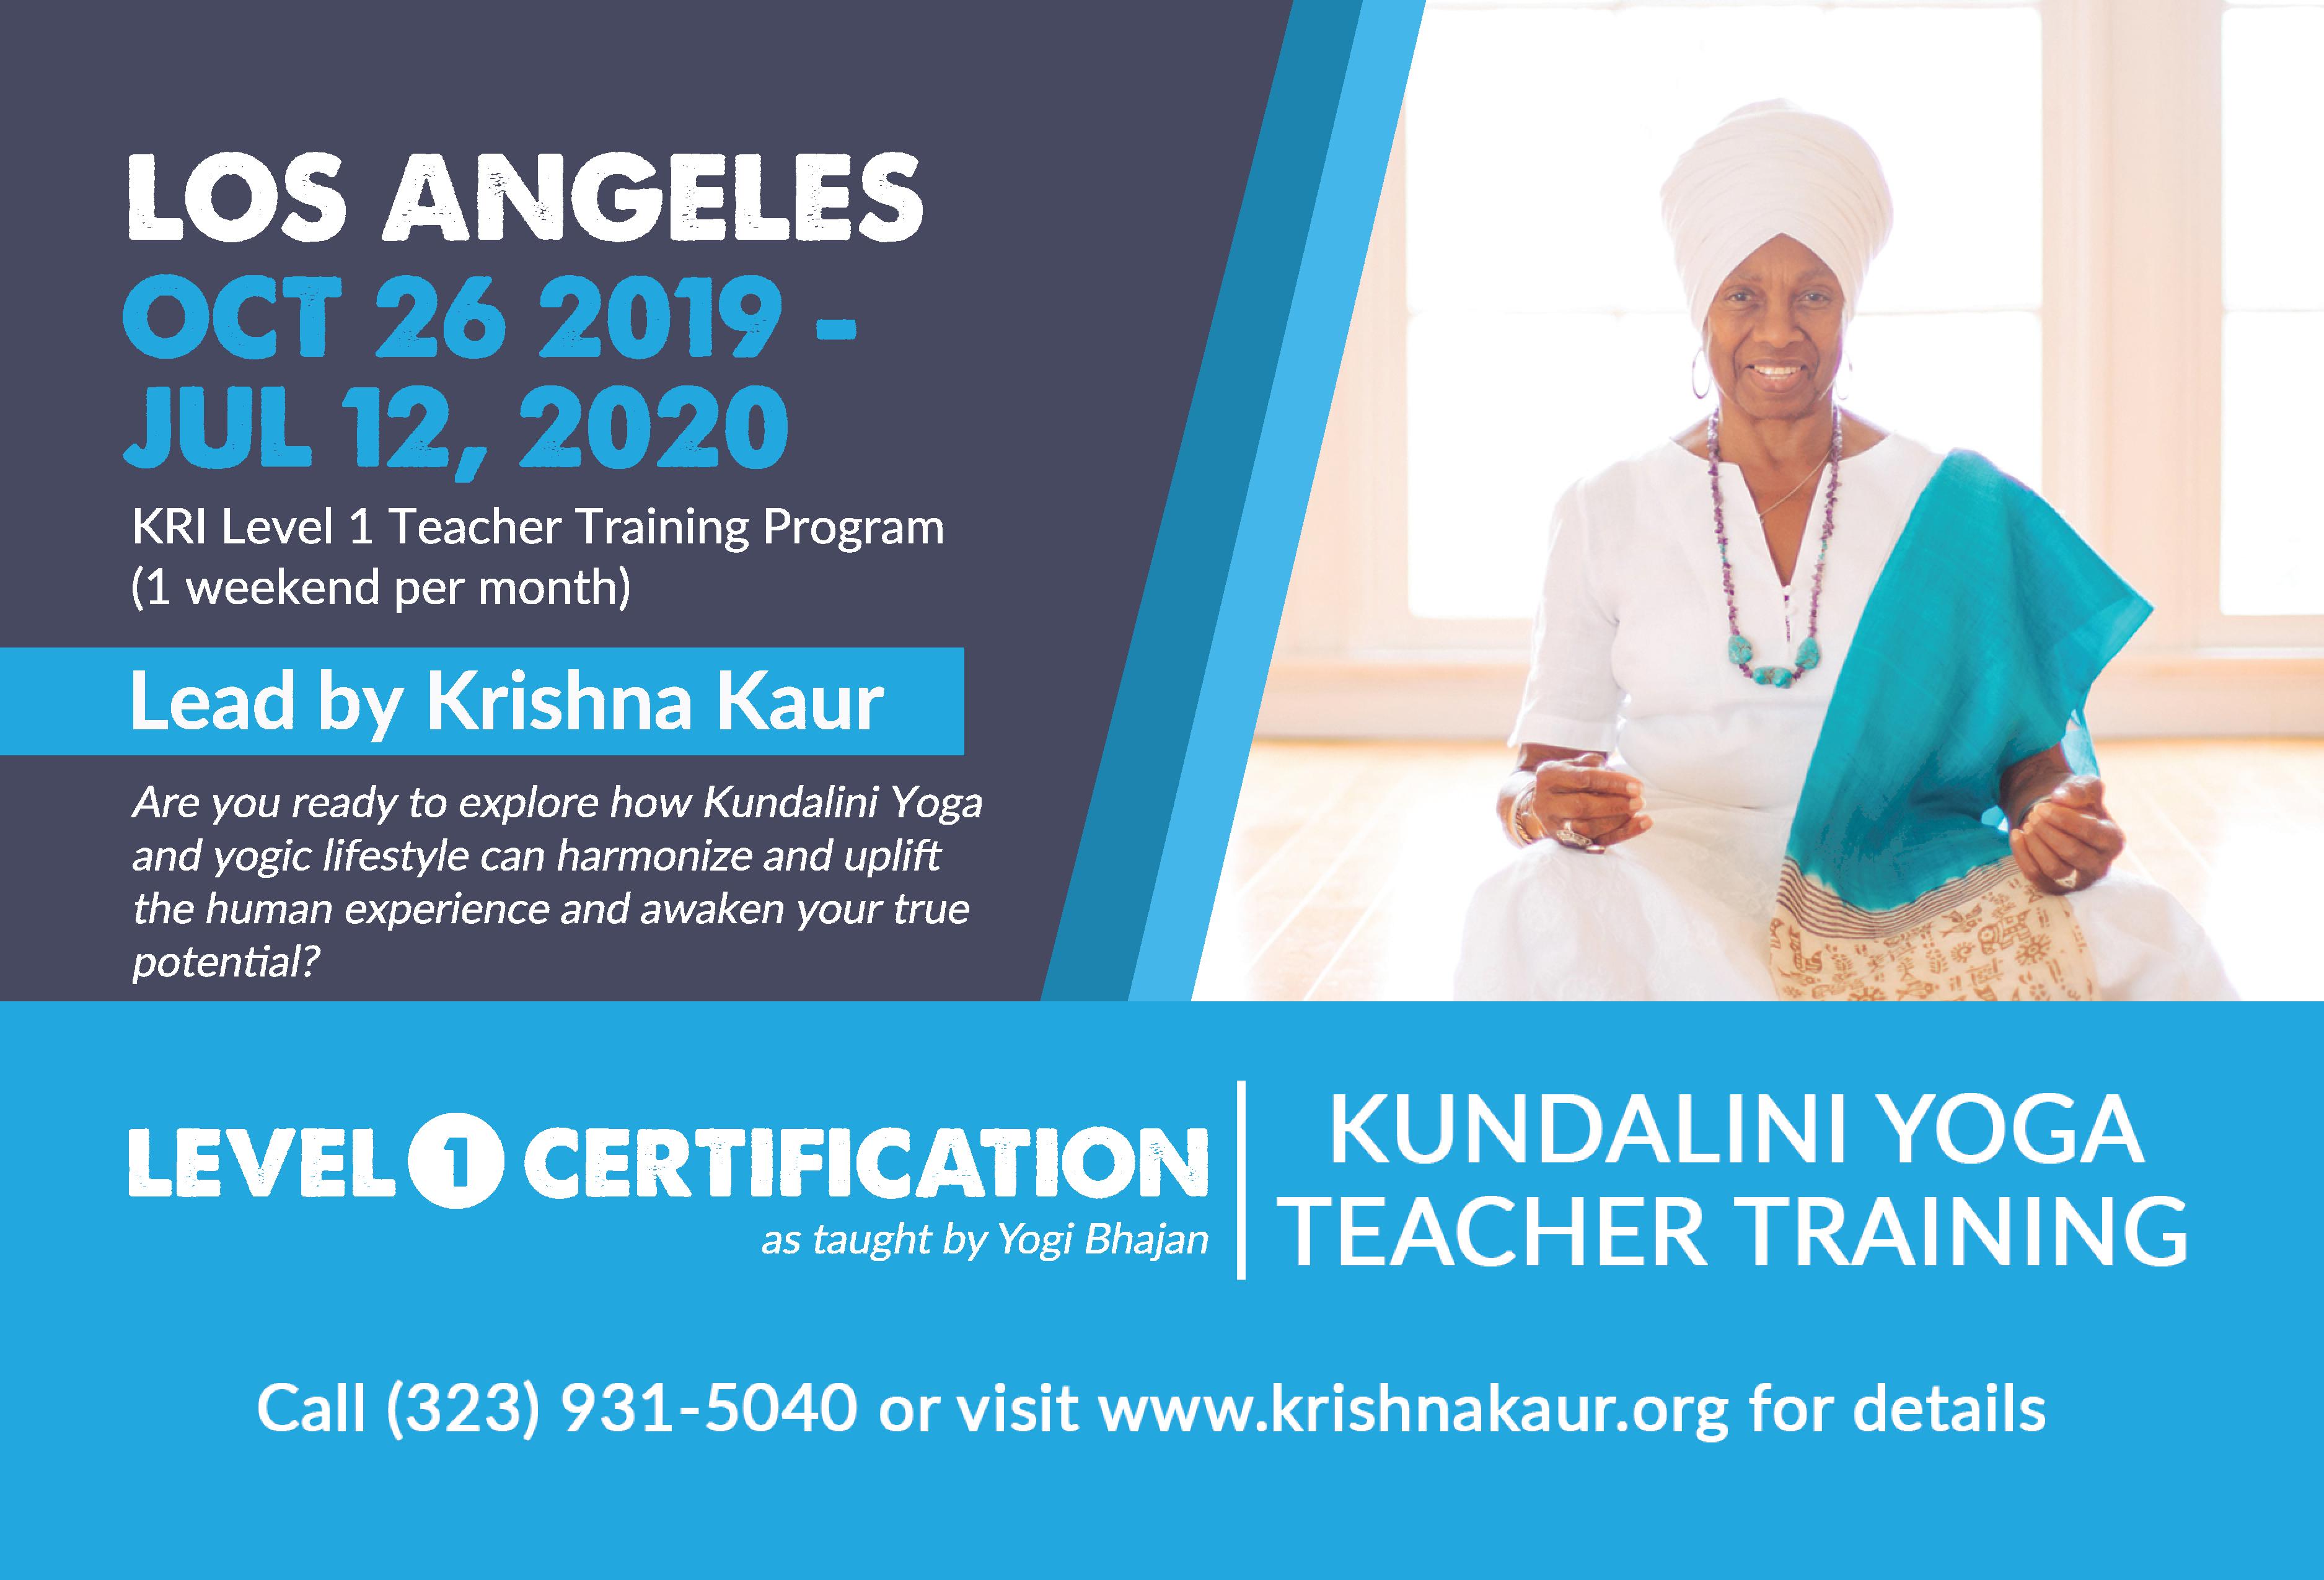 Level 1 Kri Kundalini Yoga Teacher Training Krishna Kaur